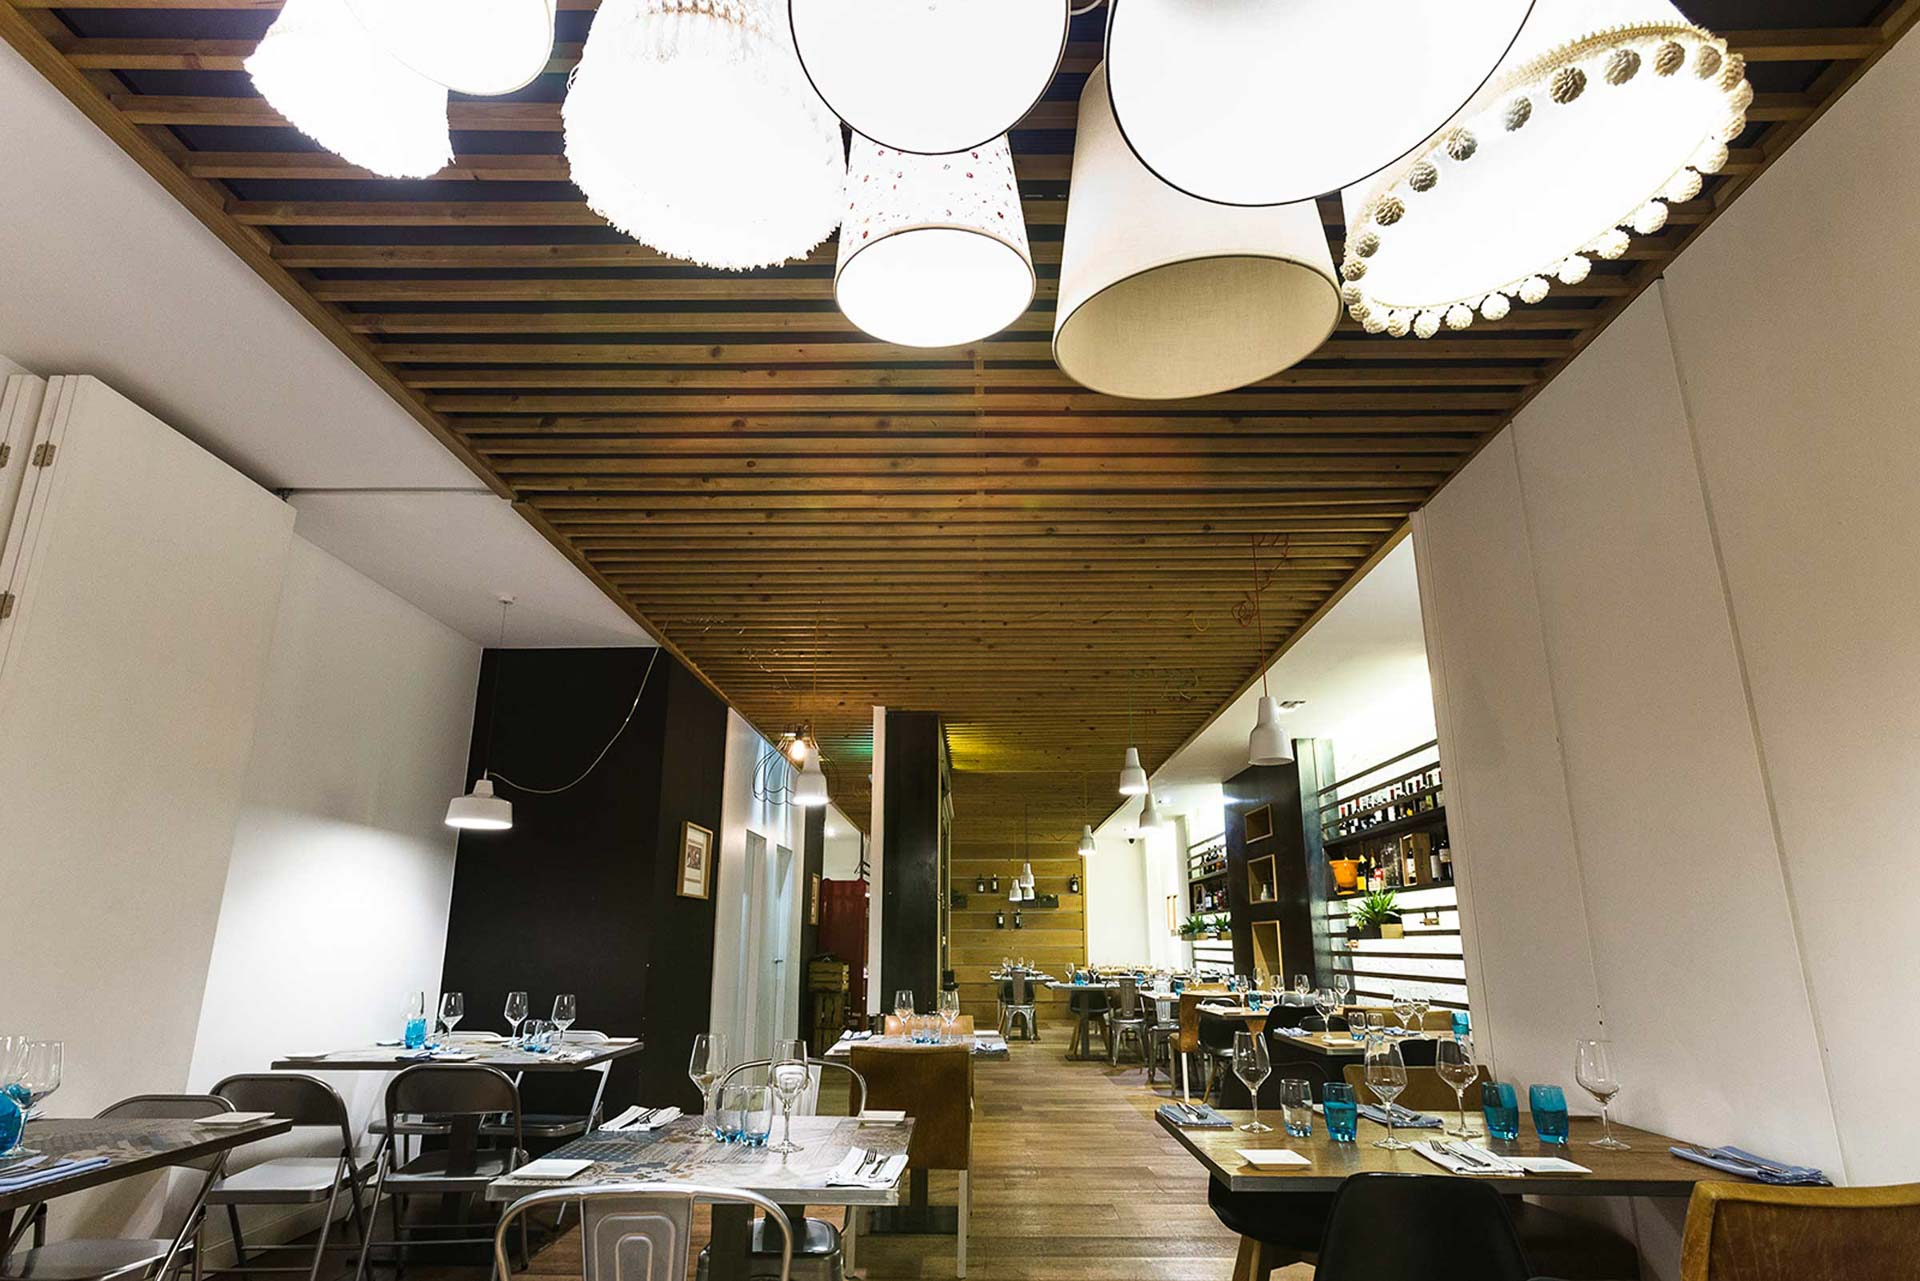 Bula Restaurante Zaragoza Fotografia Gastronomica Decoracion interior